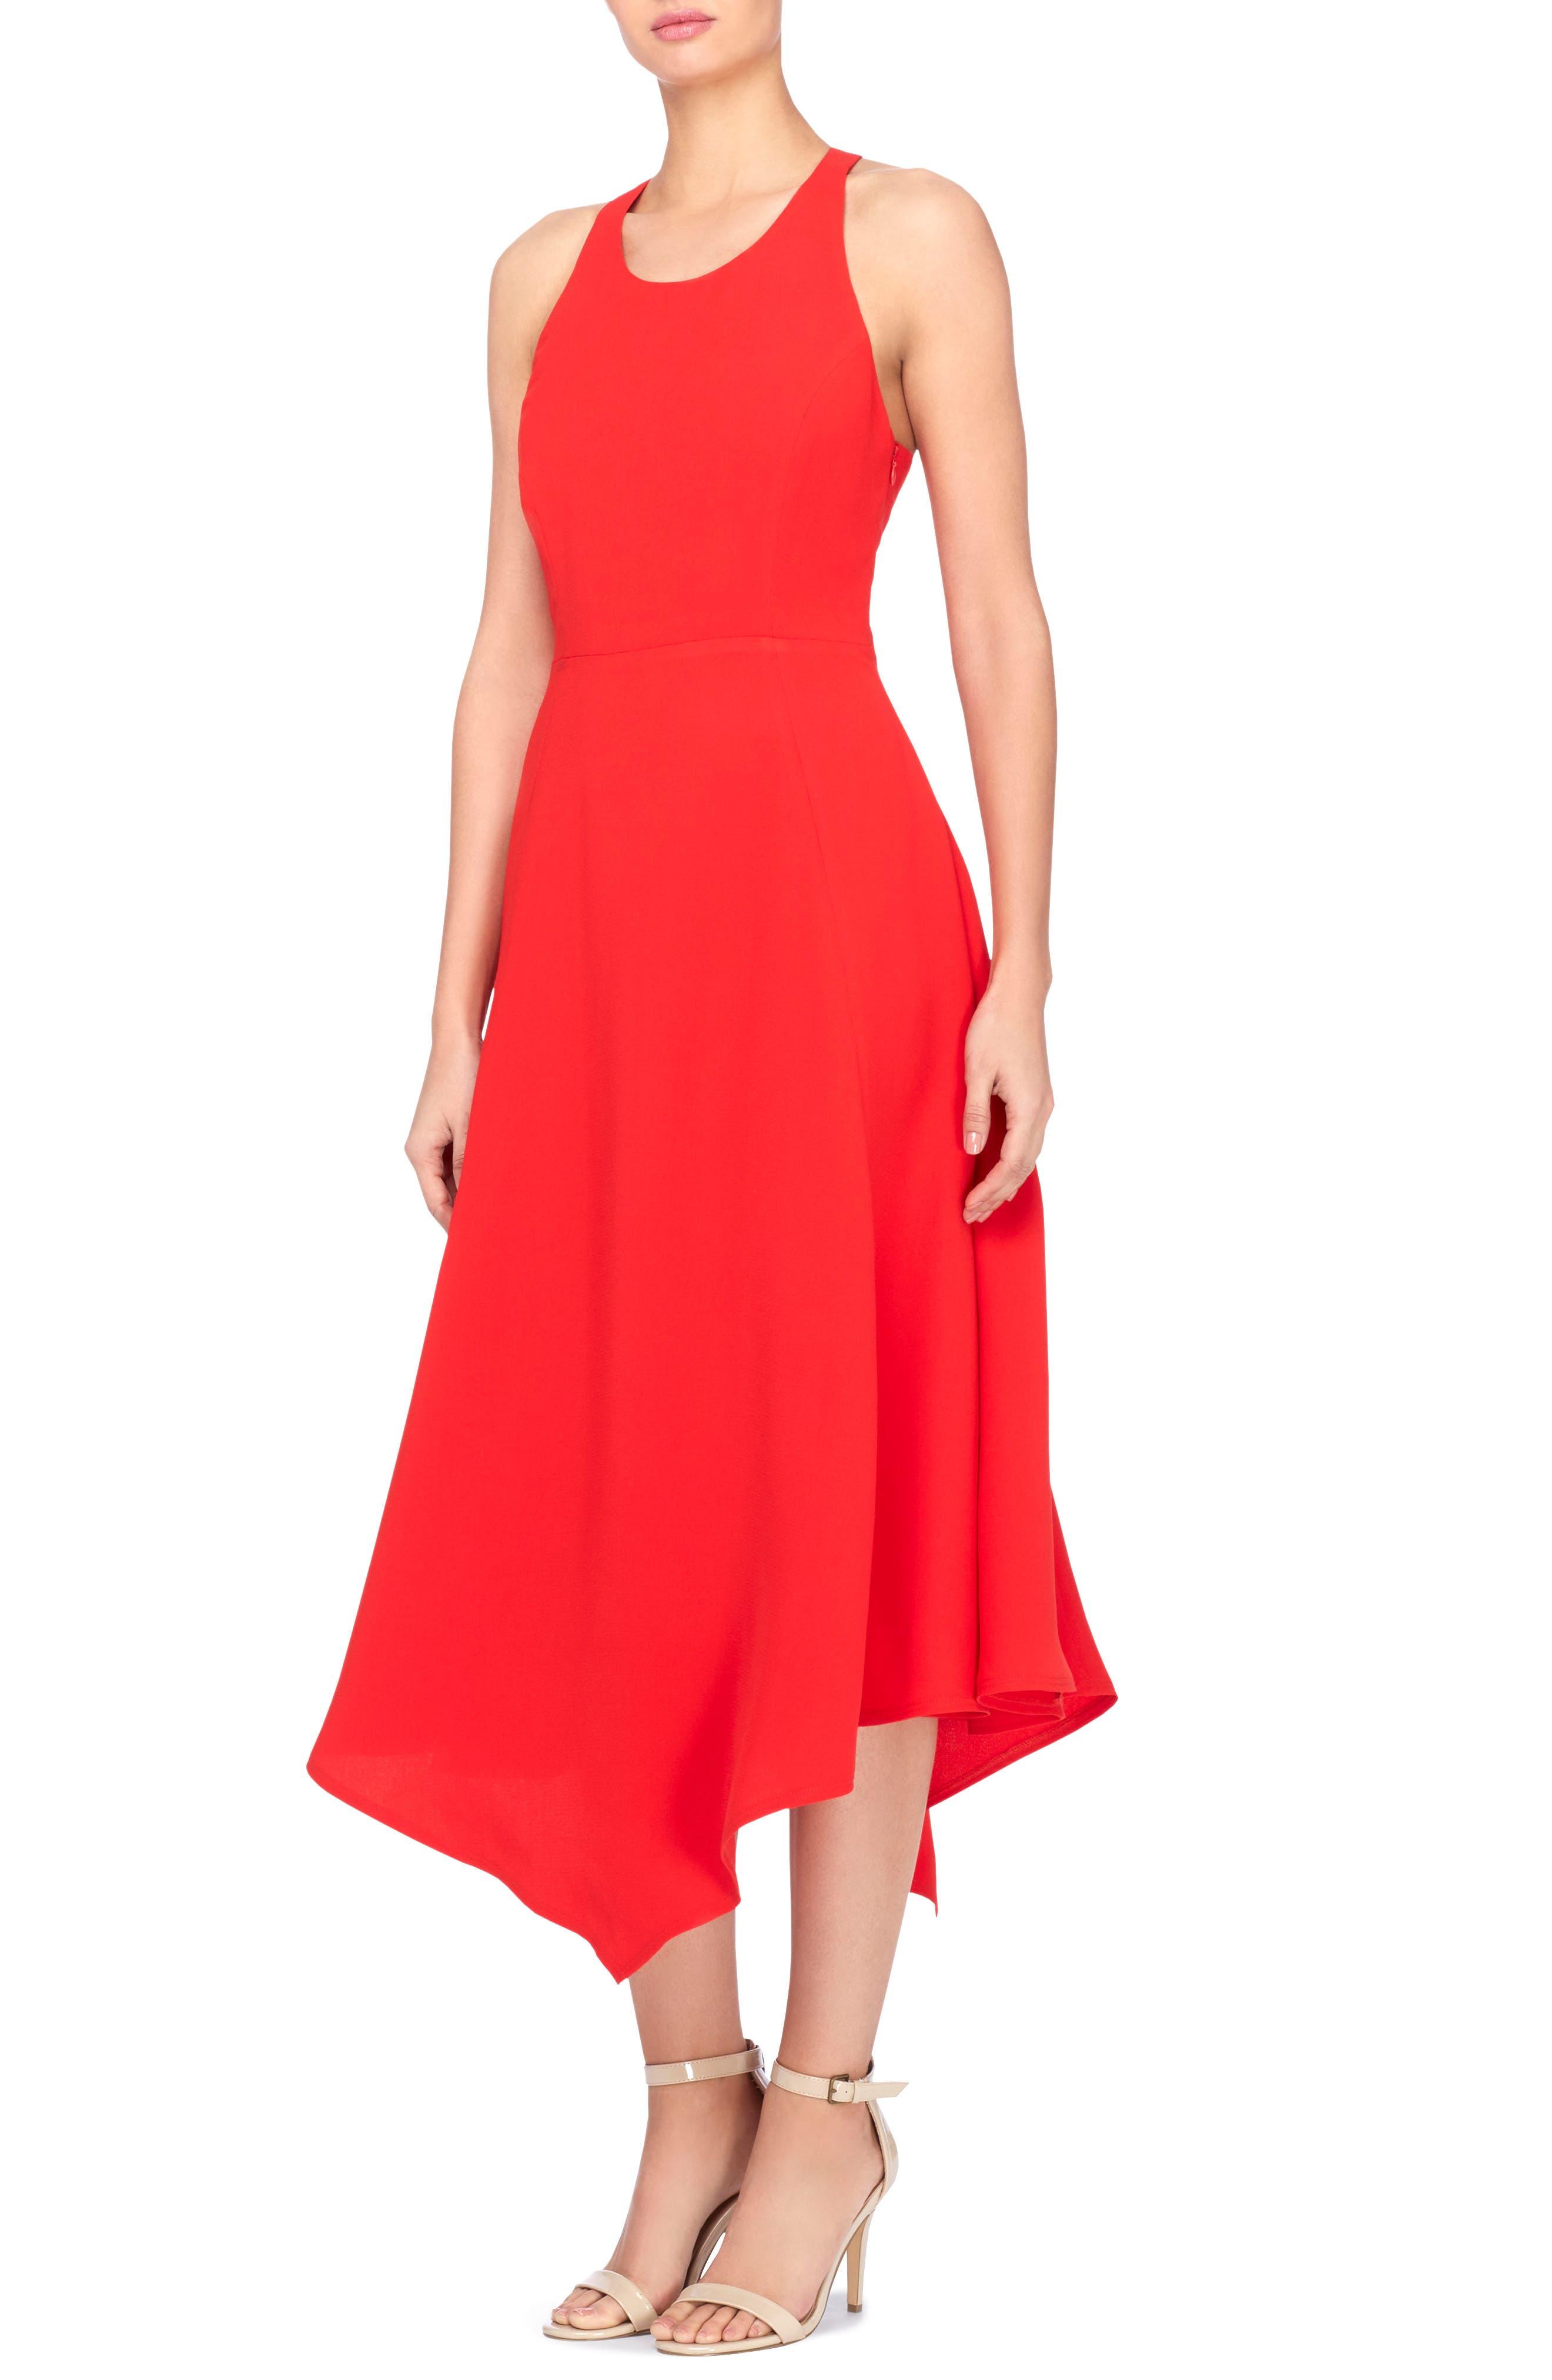 Reggie T-Back Fit & Flare Dress,                             Main thumbnail 1, color,                             Tomato Red